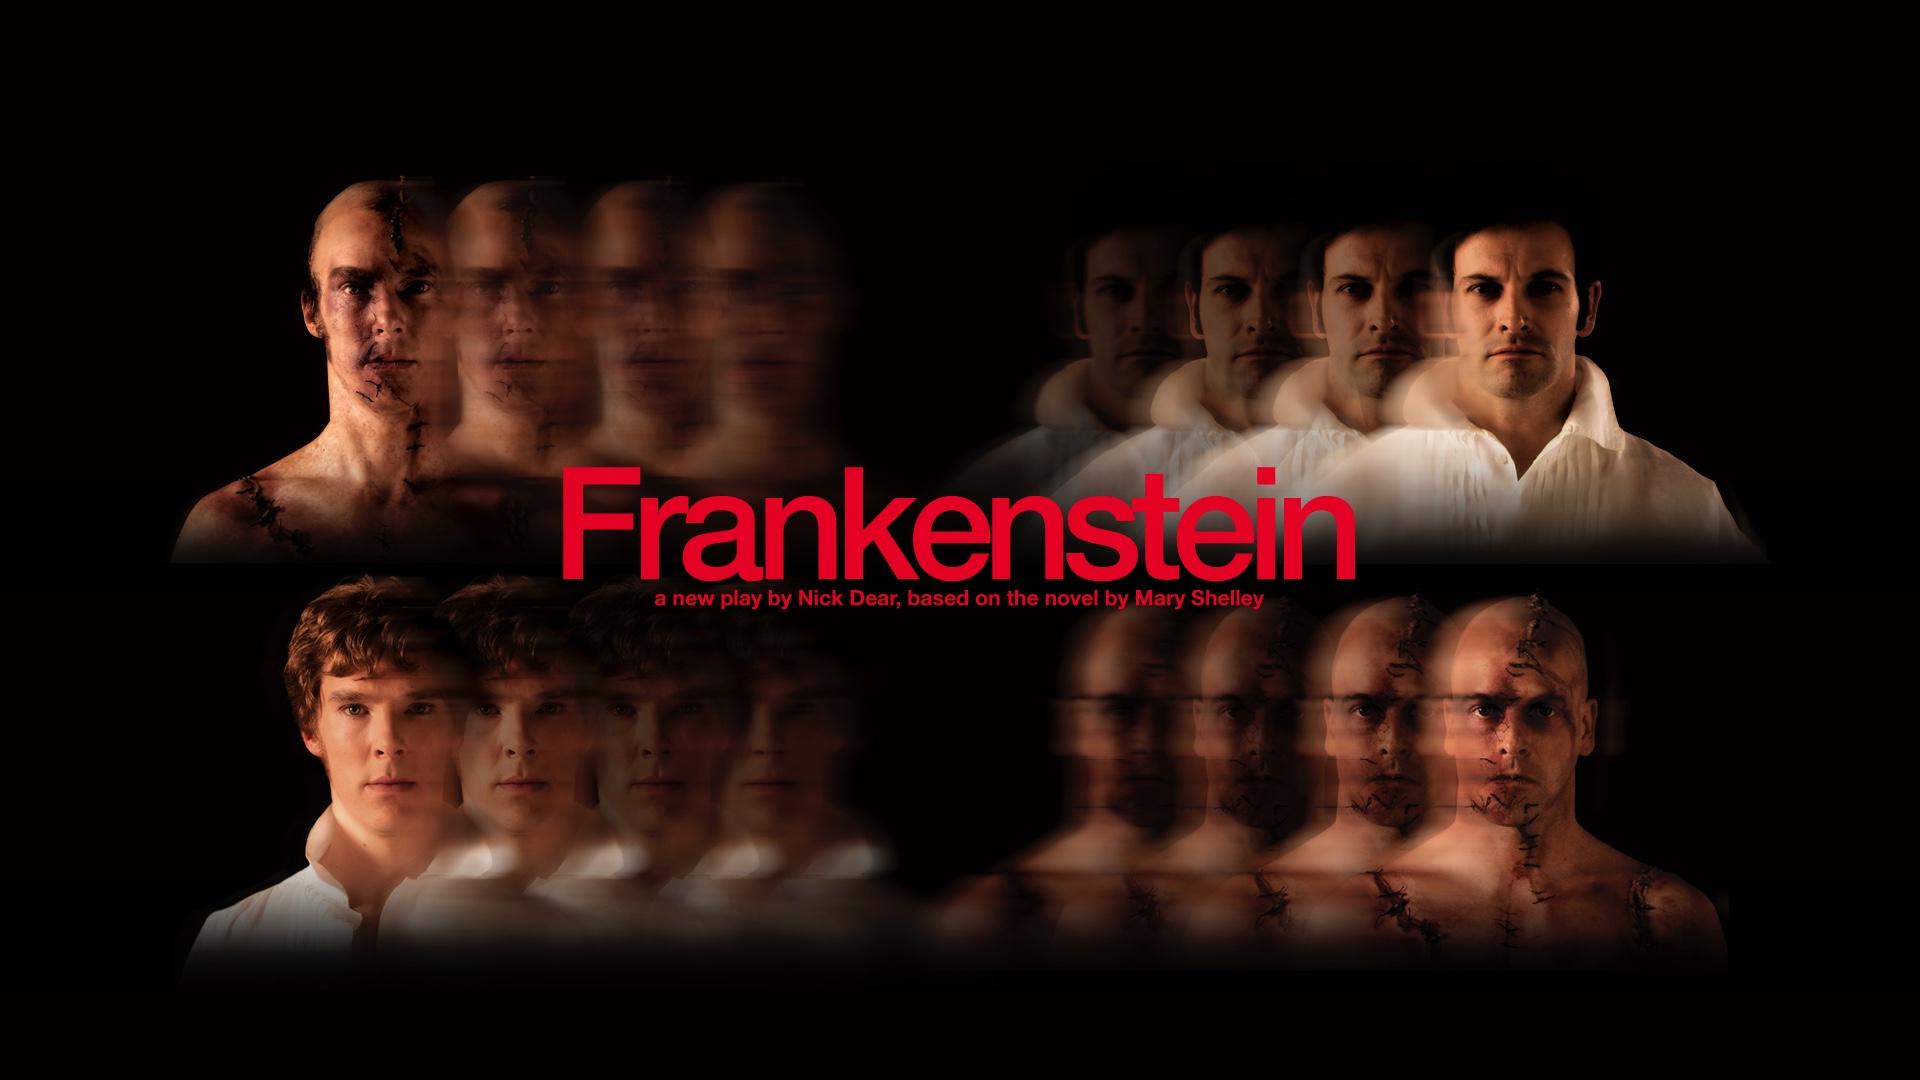 frankenstein_02-benedict-cumberbatch